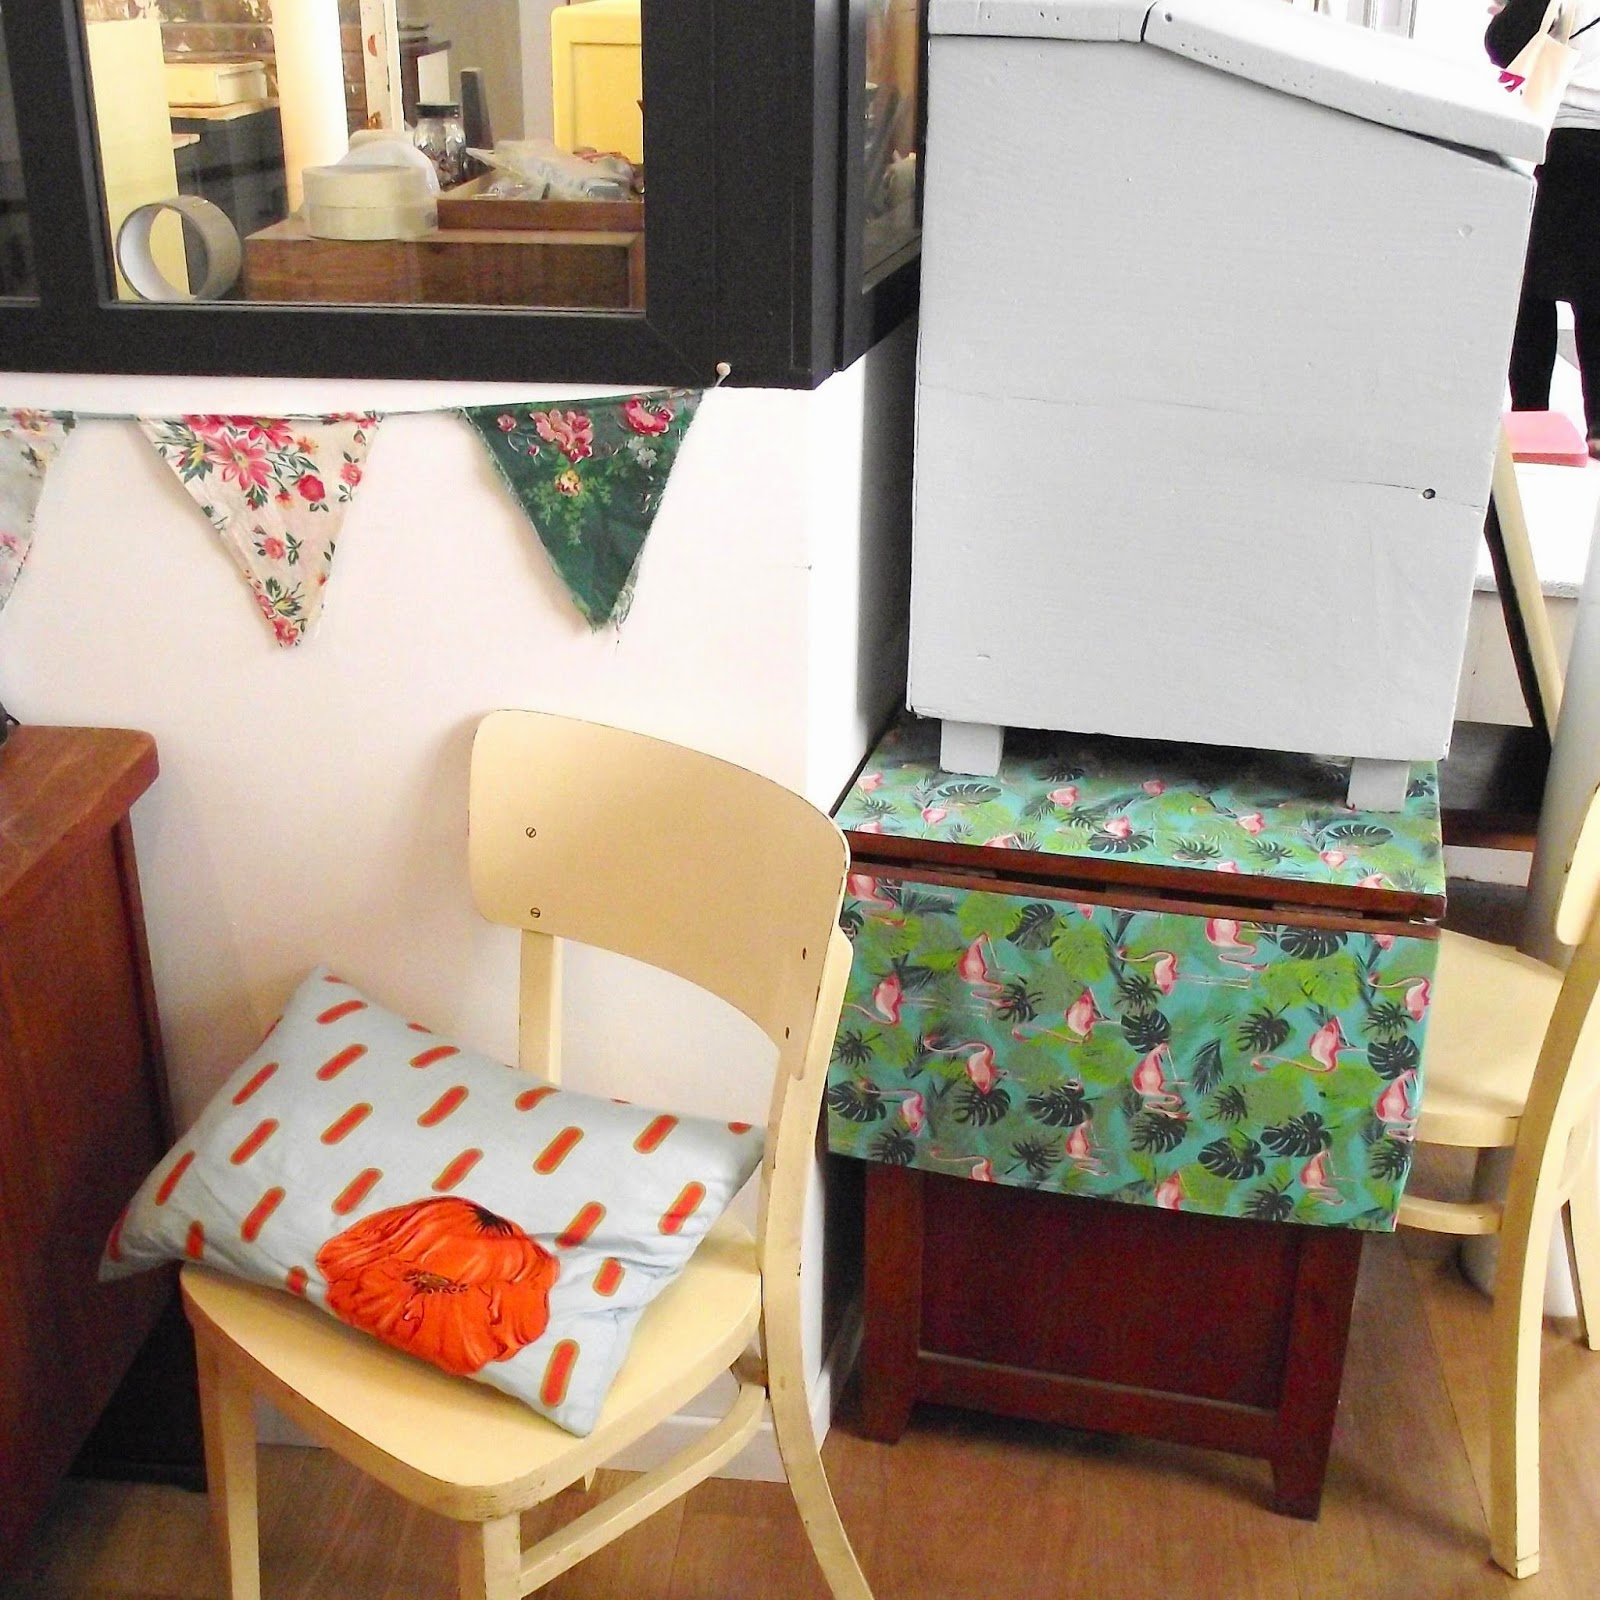 les petits meubles de marie robert et moi nalou 39 s in the air. Black Bedroom Furniture Sets. Home Design Ideas